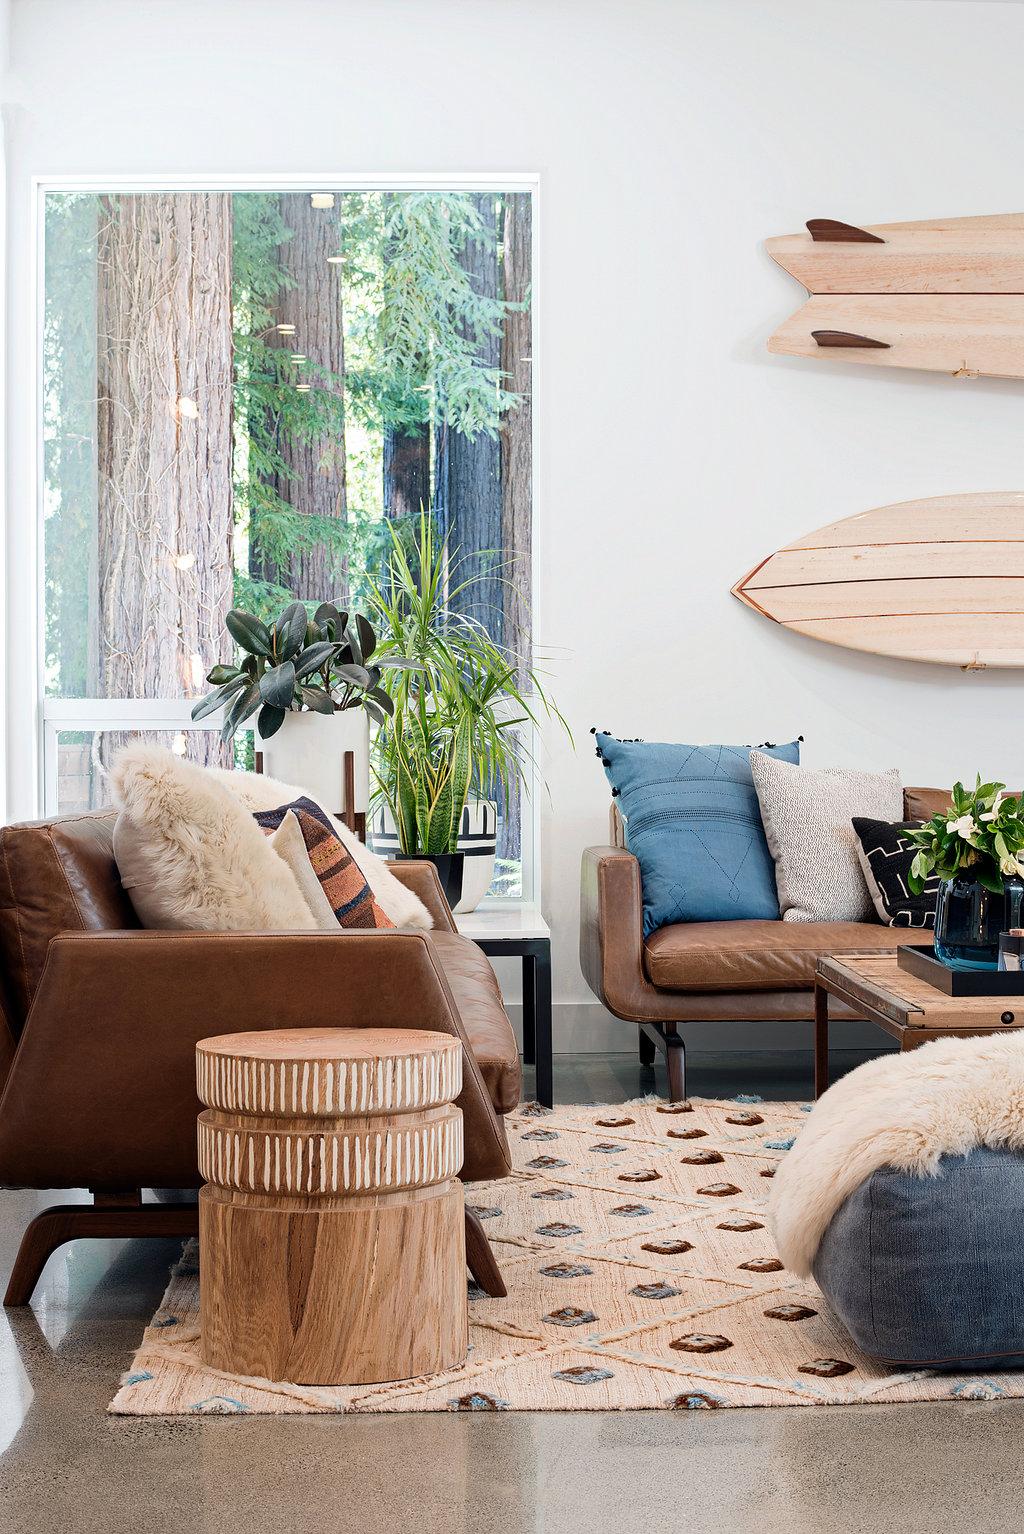 06+rbdmarin+living+room+detail+copy.jpg